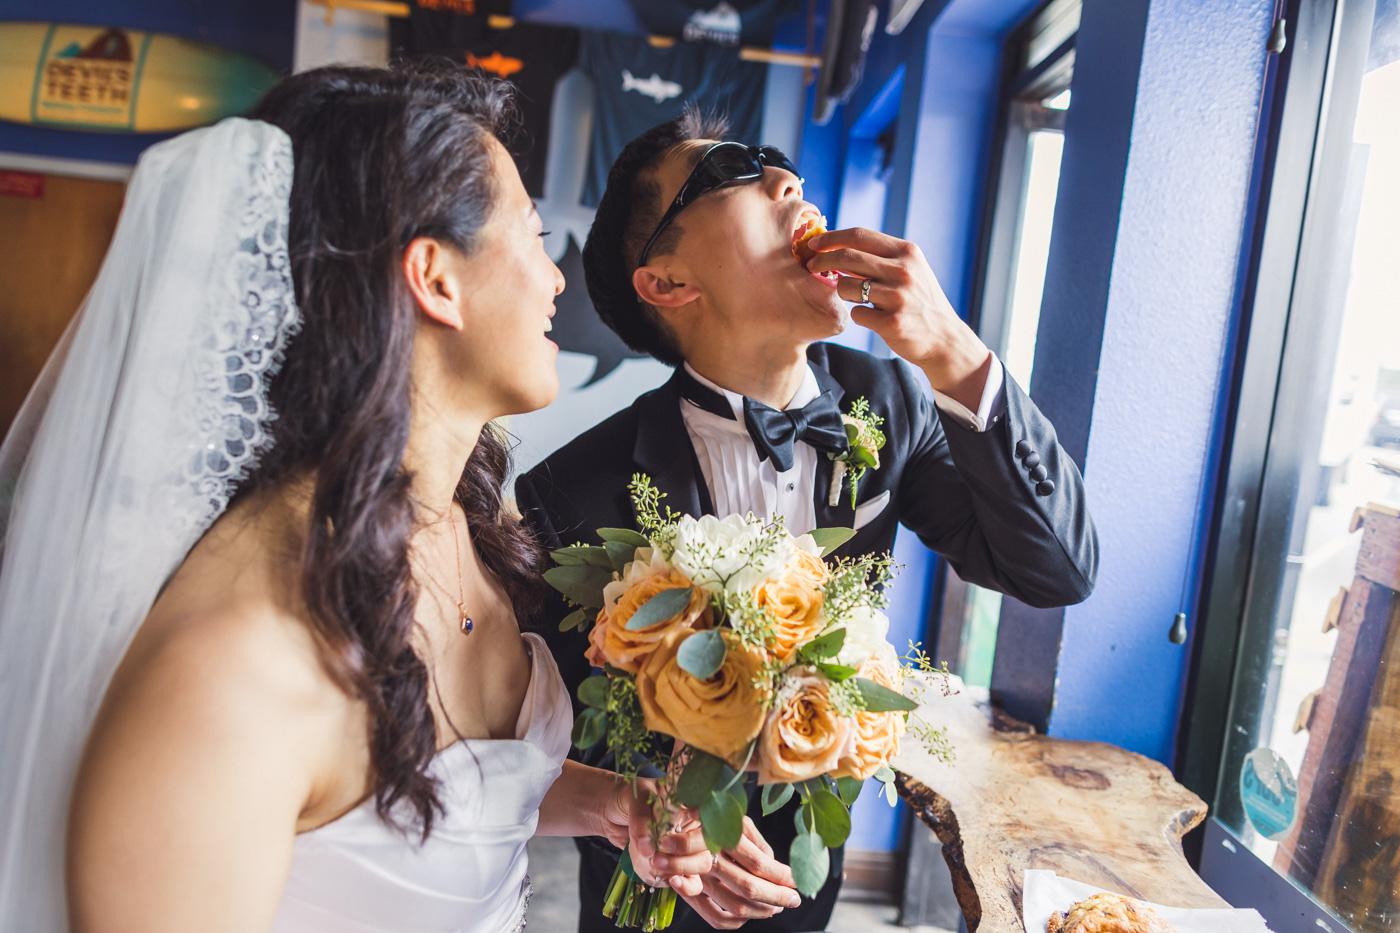 bride-and-groom-eating-devils-teeth-baking-company-treats